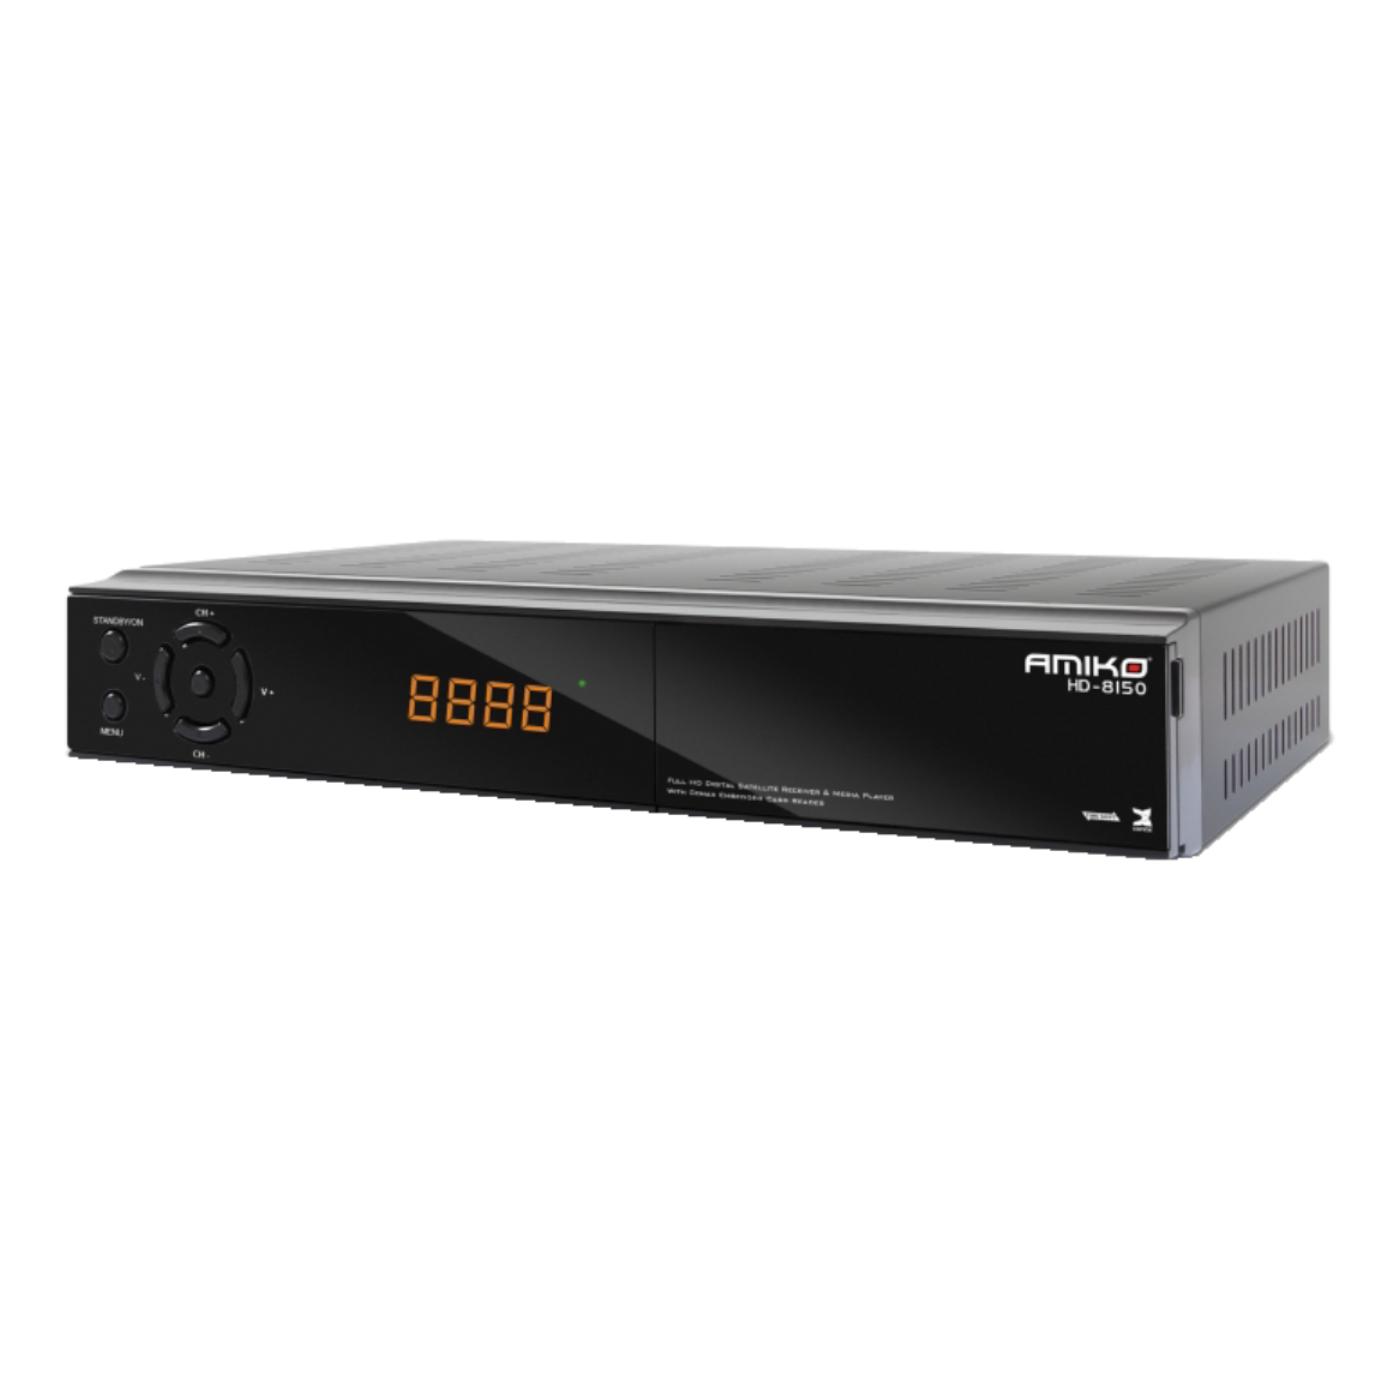 HD8150